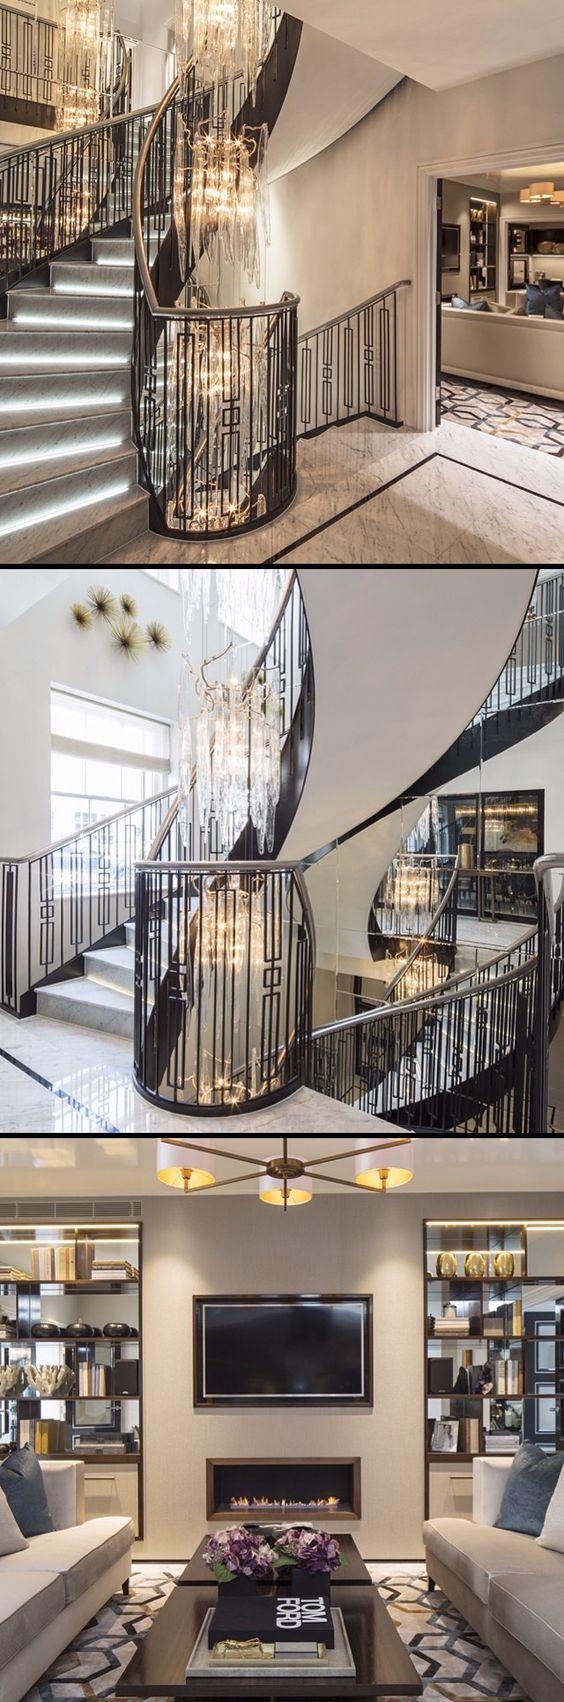 Laura Hammett luxury interiors